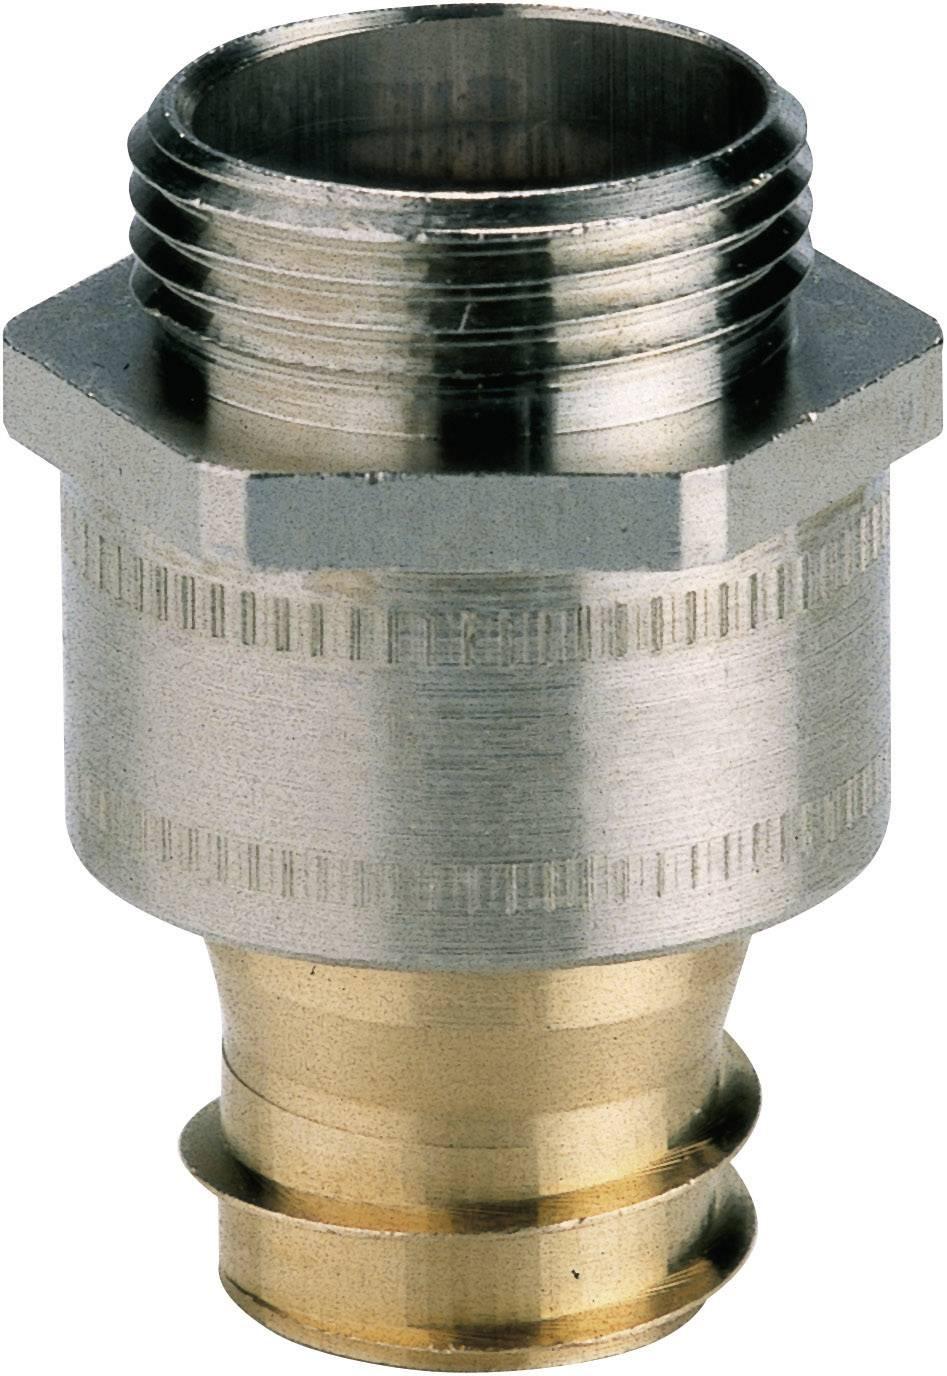 Hadicová spojka rovná LappKabel SILVYN® LI-M 10x1,5 SGY 61802369, M10, stříbrná, 1 ks